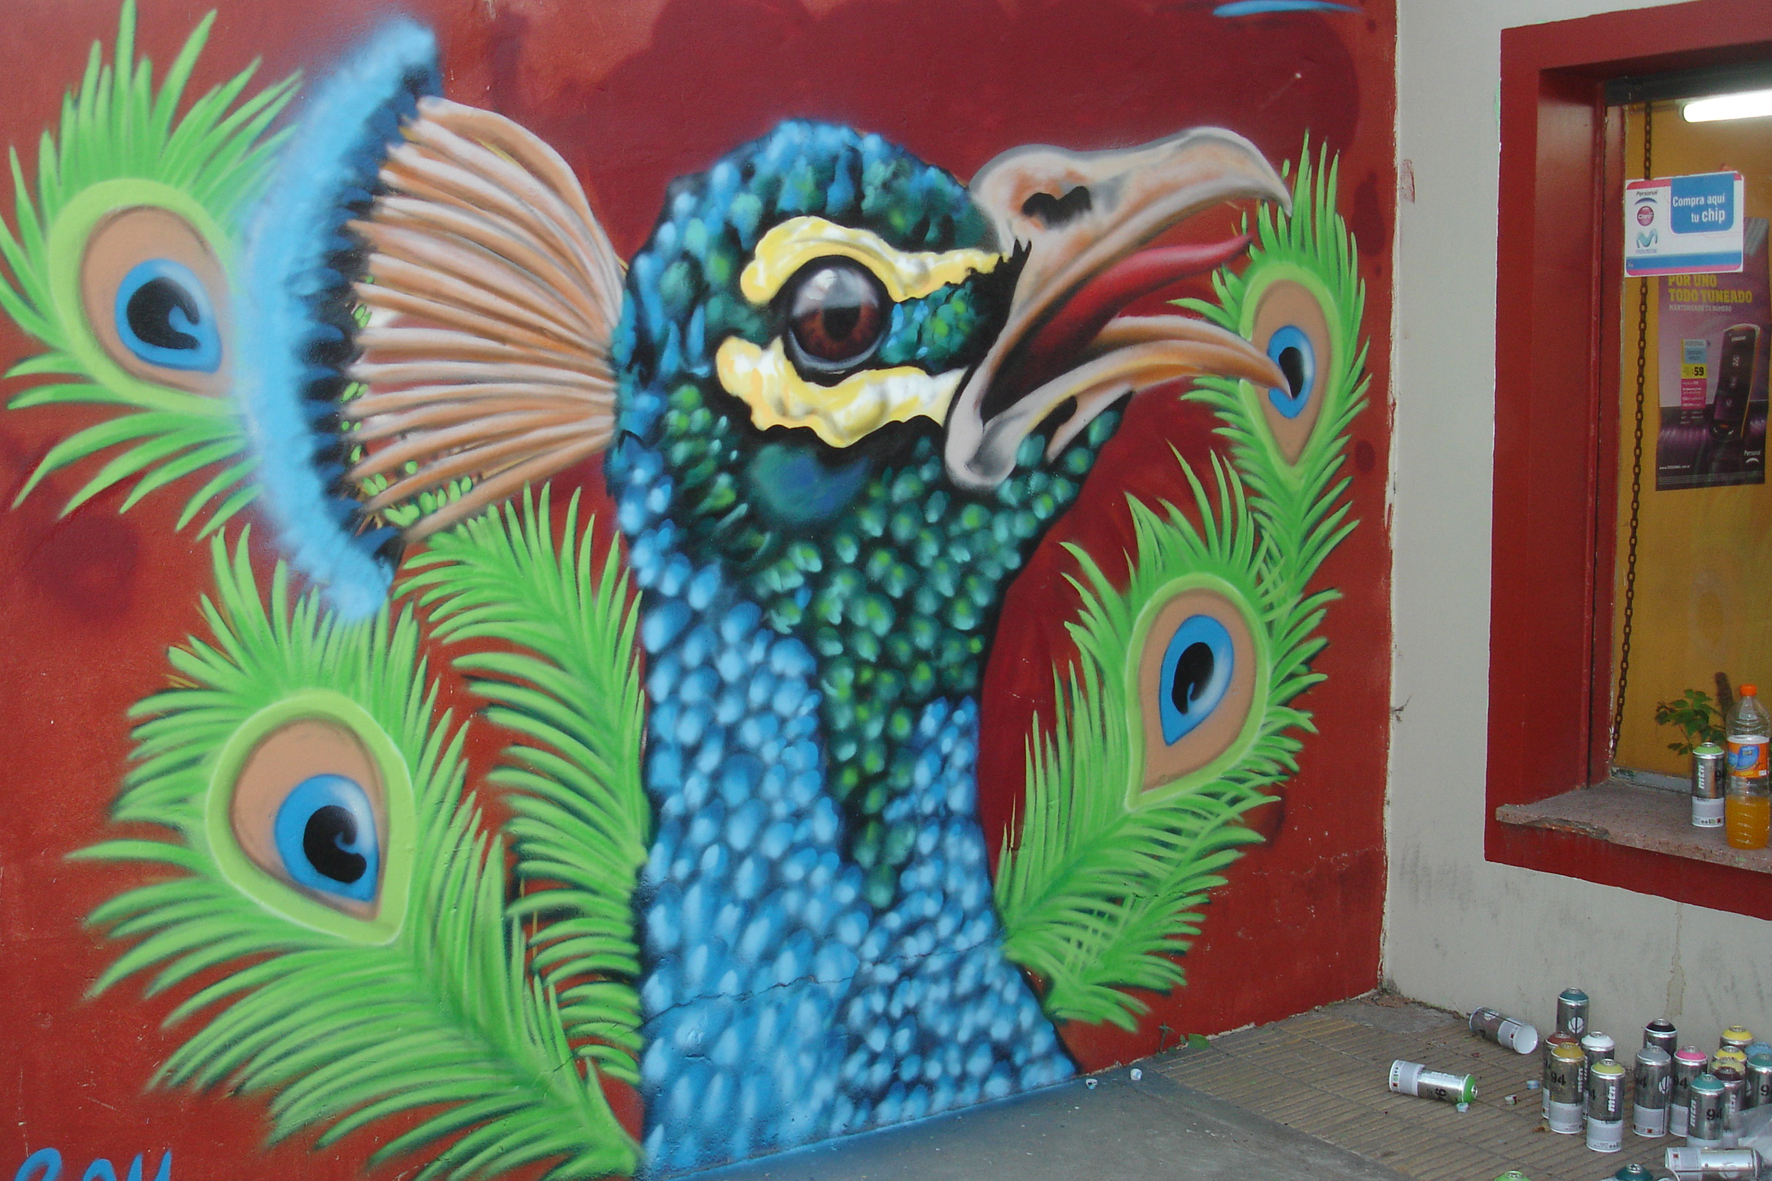 murales graff grafyttis arte urbanocallejero pintura  webab